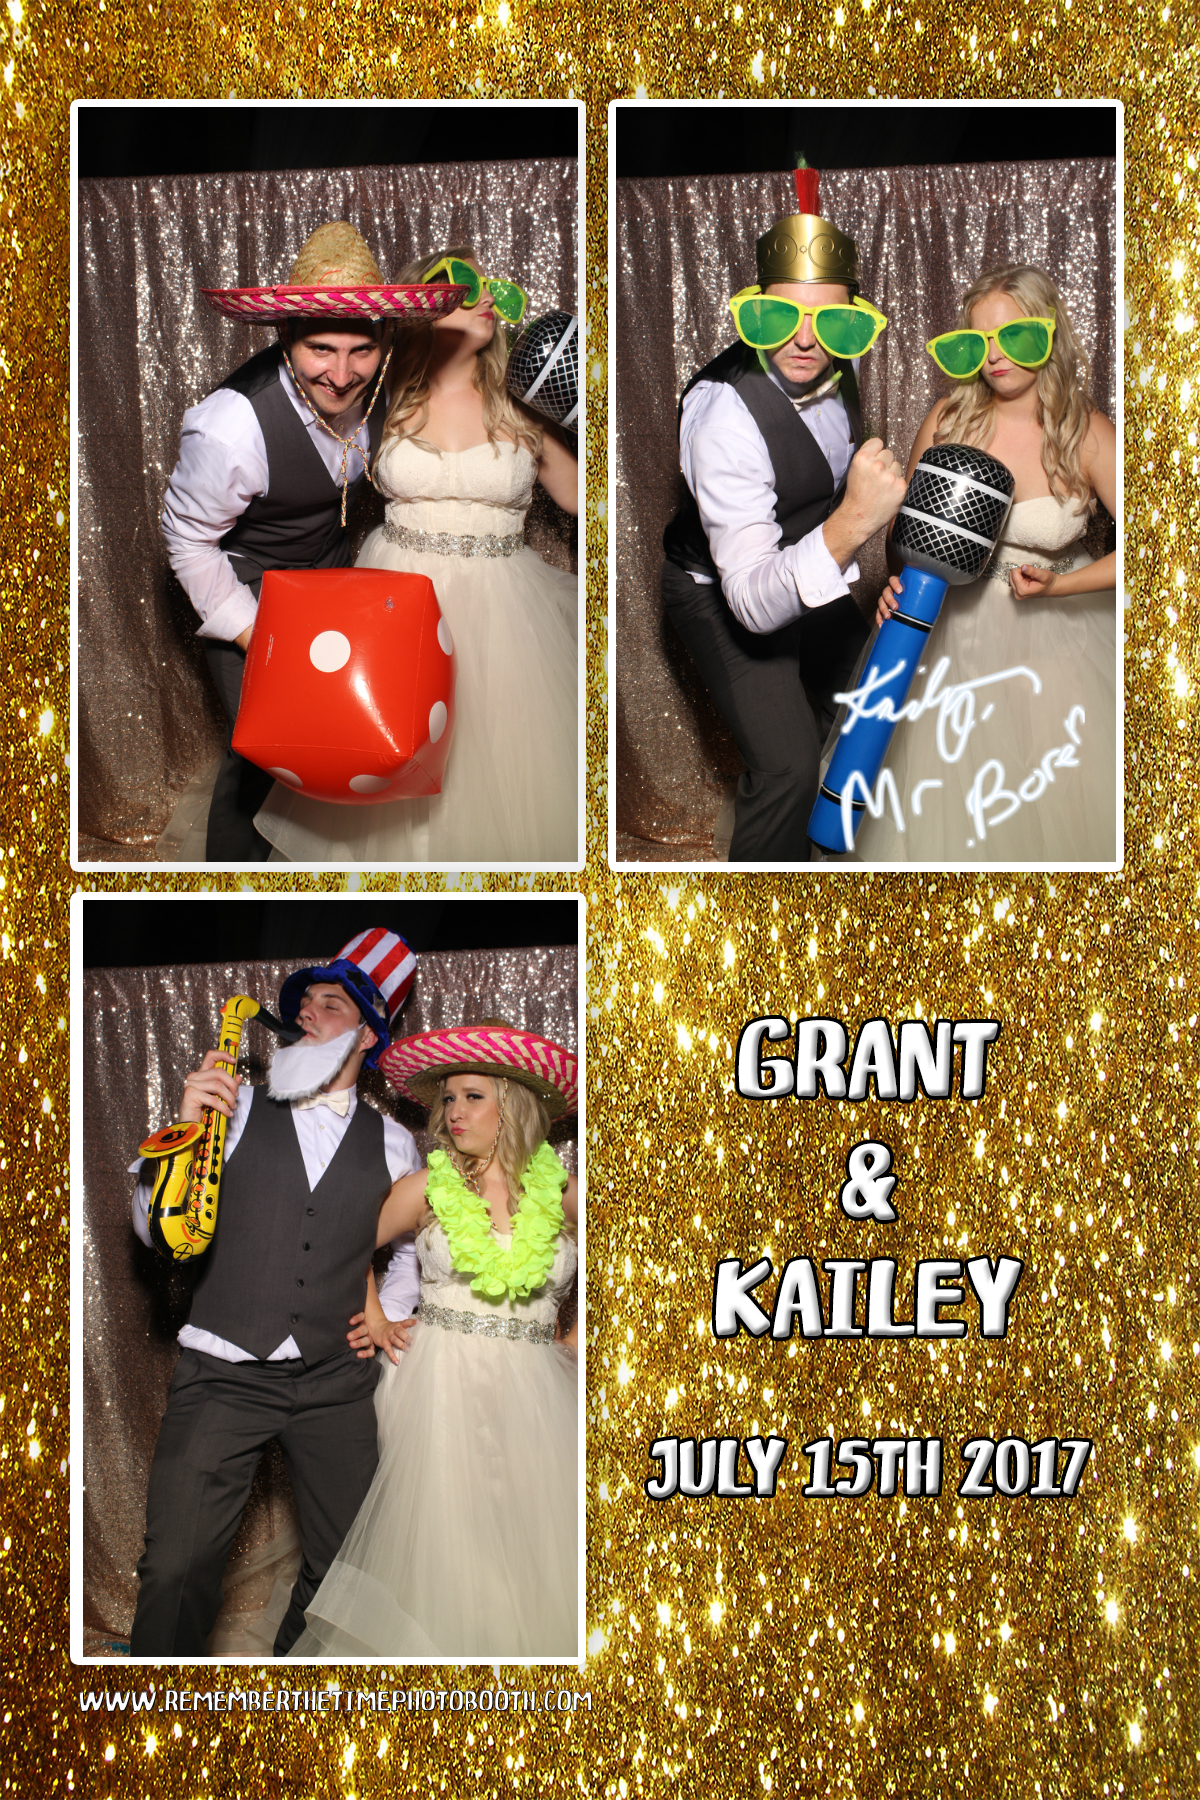 wedding photo booth new braunfels